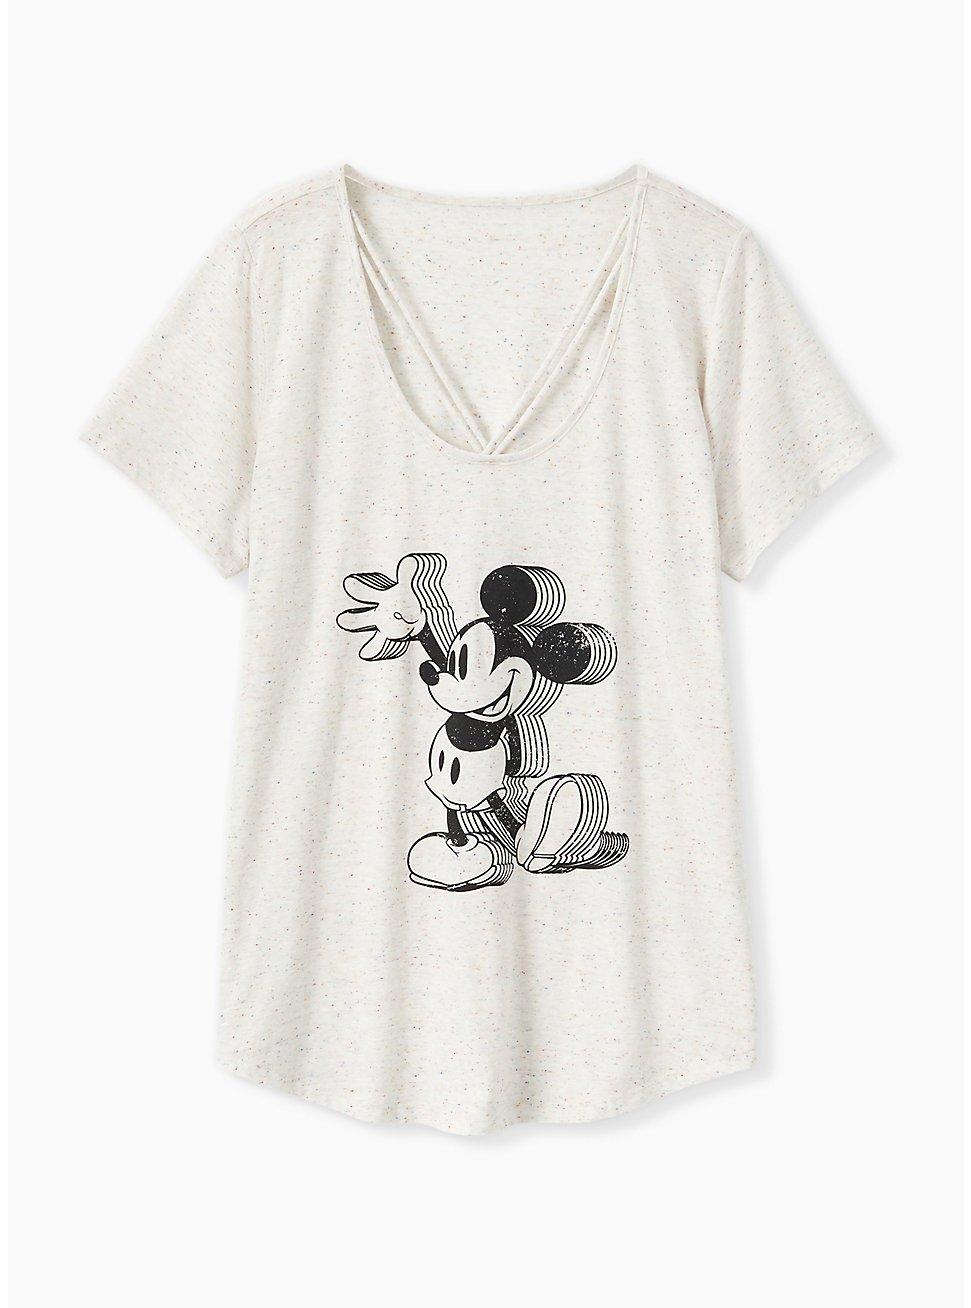 Disney Mickey Mouse Ivory Confetti Lattice Top, NATURAL IVORY, hi-res